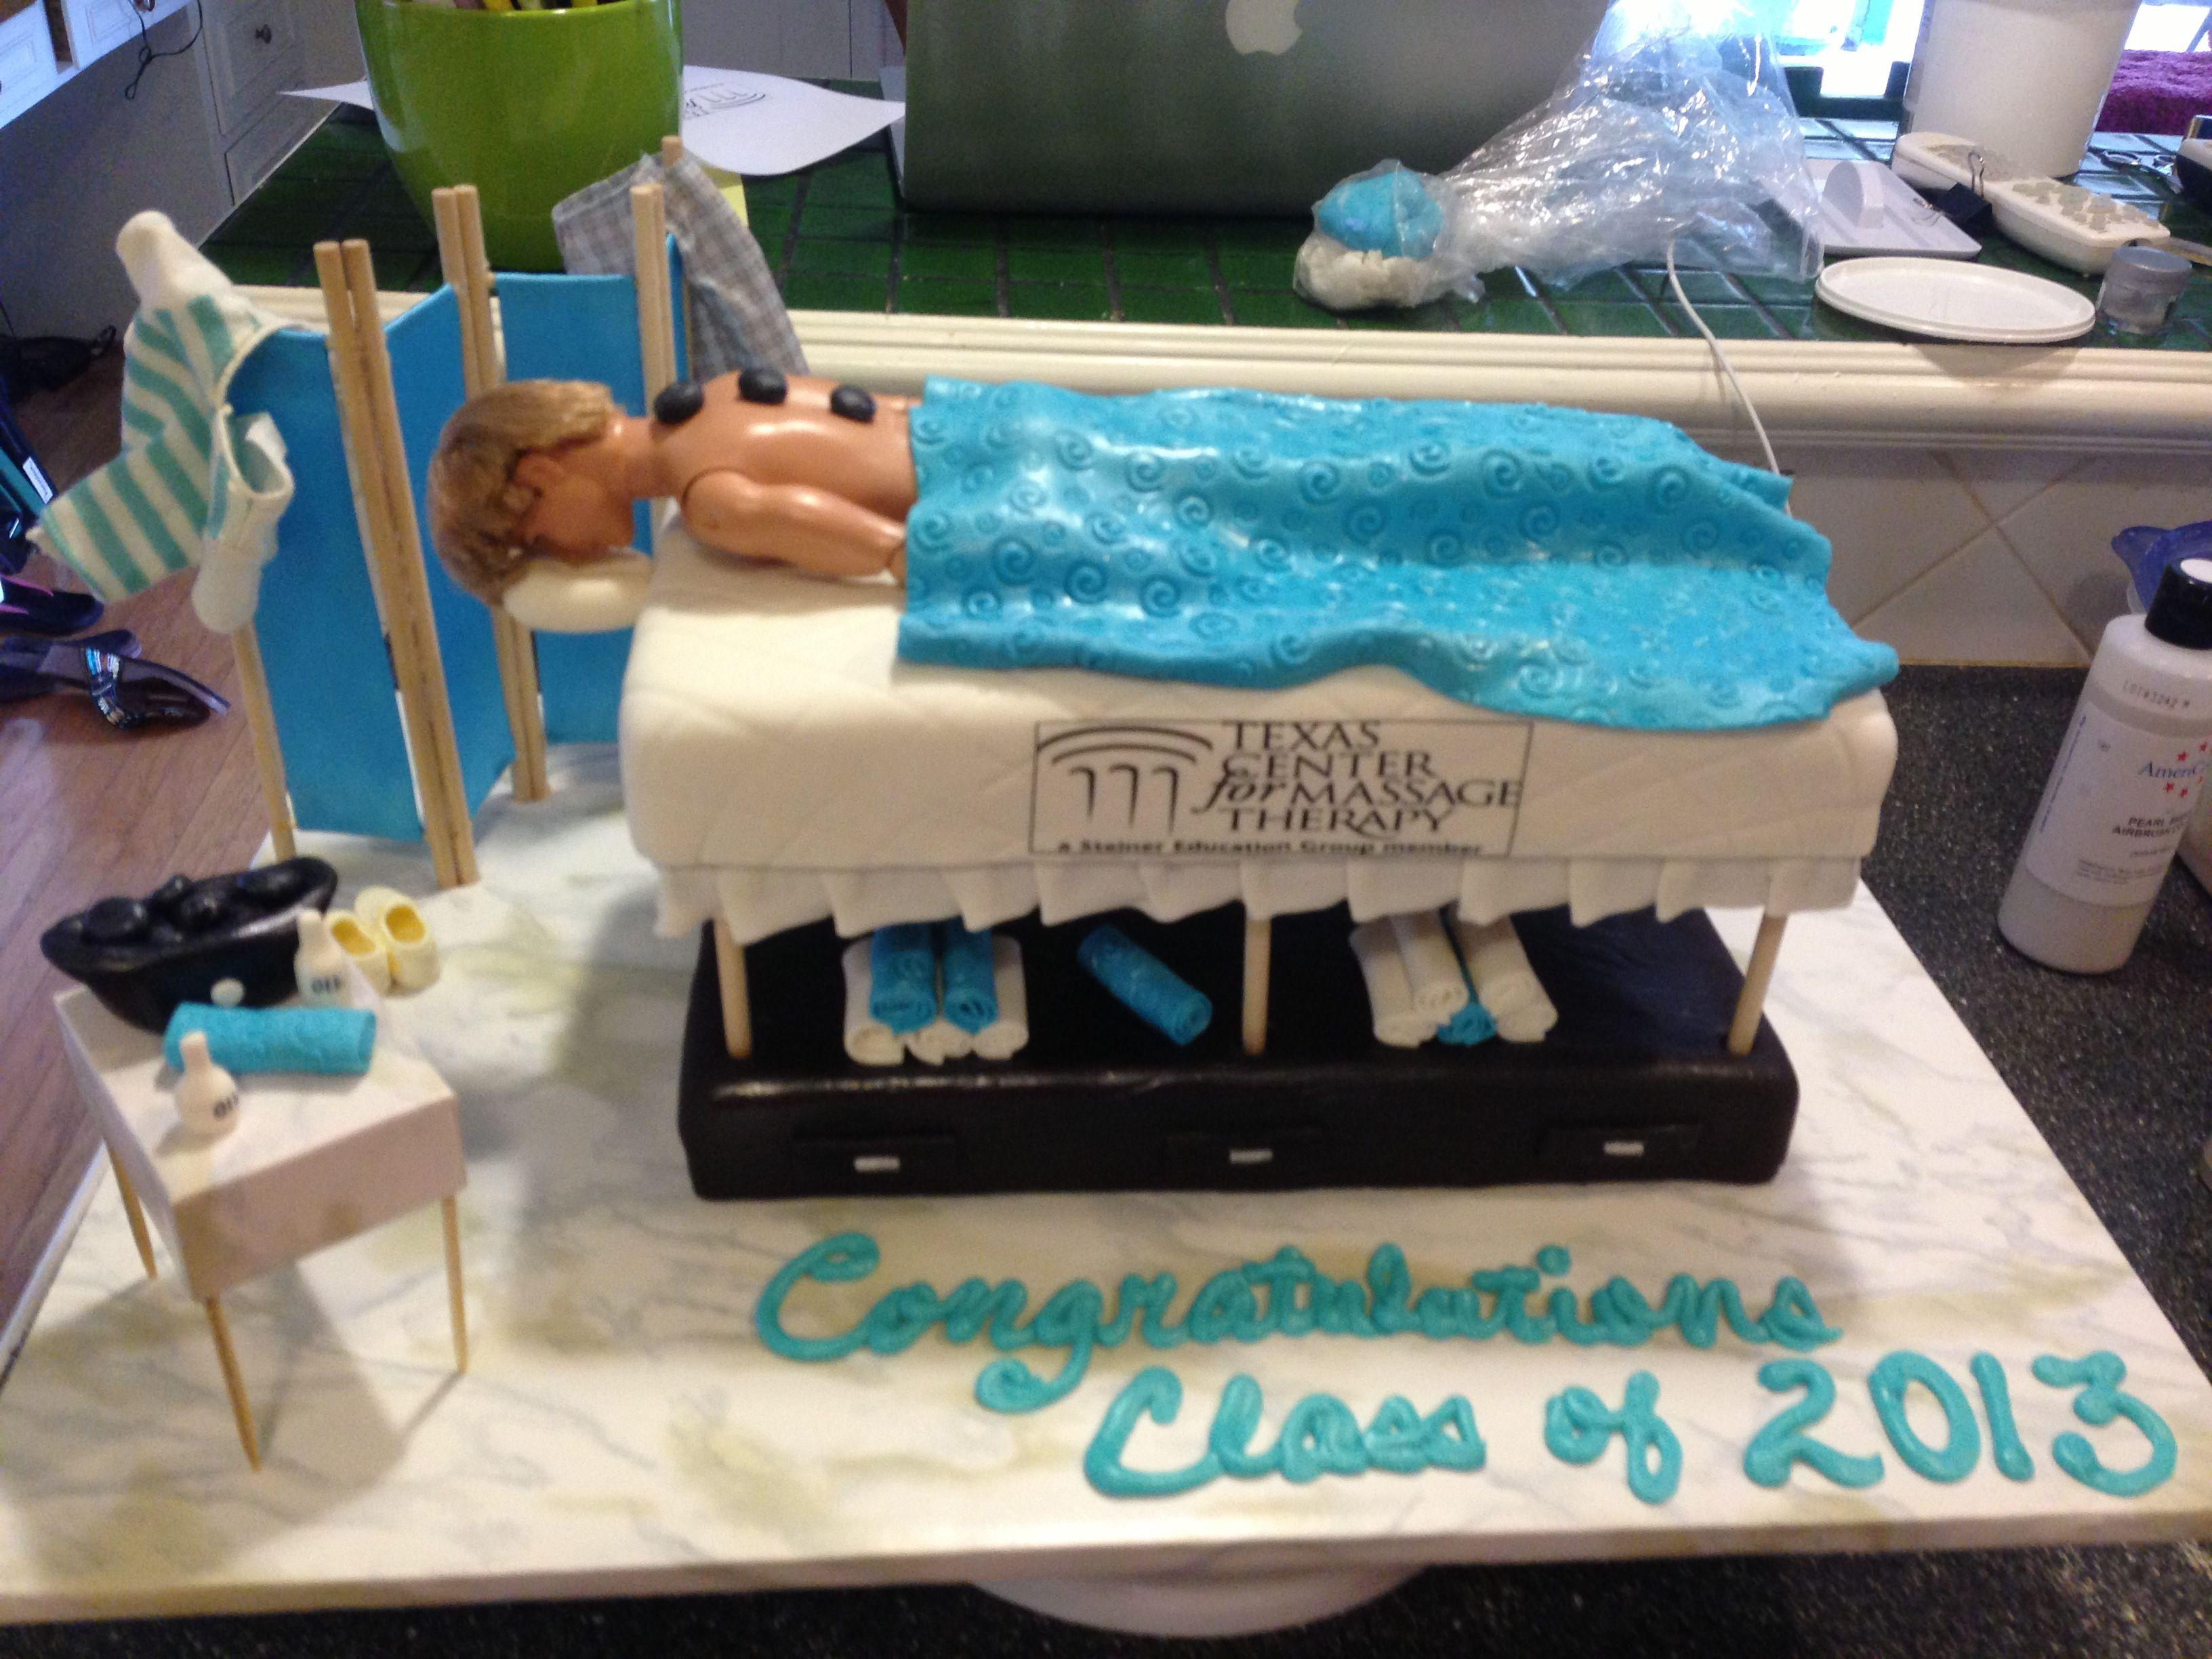 Birthday Cake Images And Massage : Massage Table Cake Cake s Makeup & Cosmetology ...